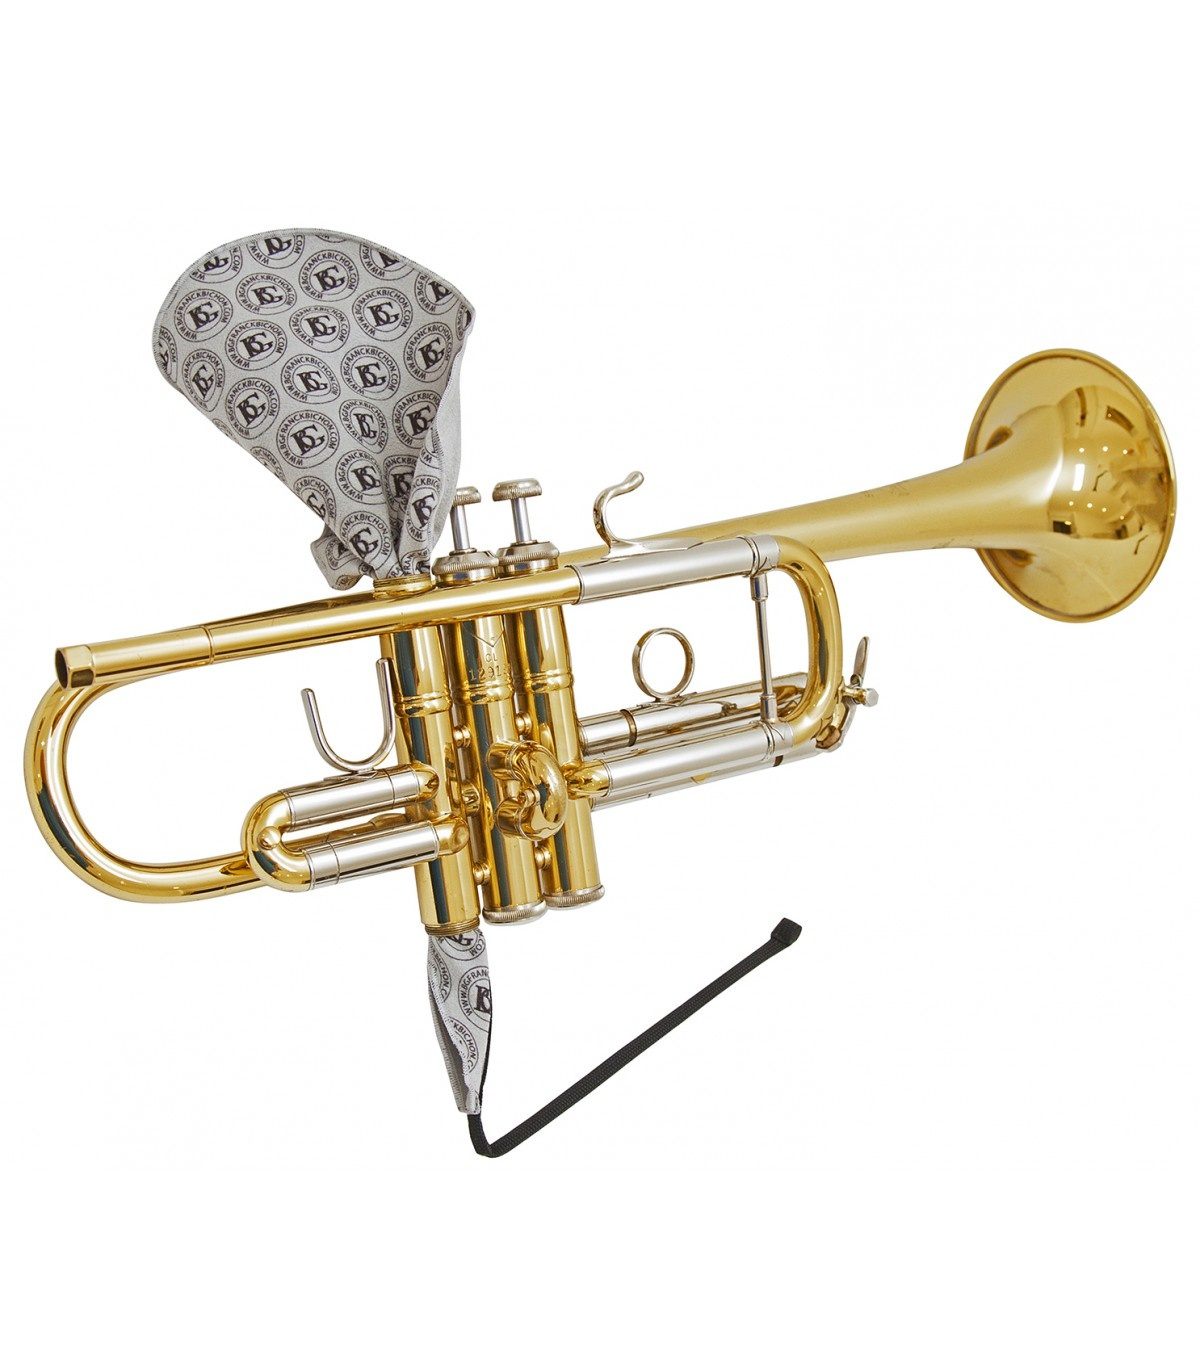 BG BG A31T Valve Casing Swab for Trumpet, Flugelhorn, Cornet